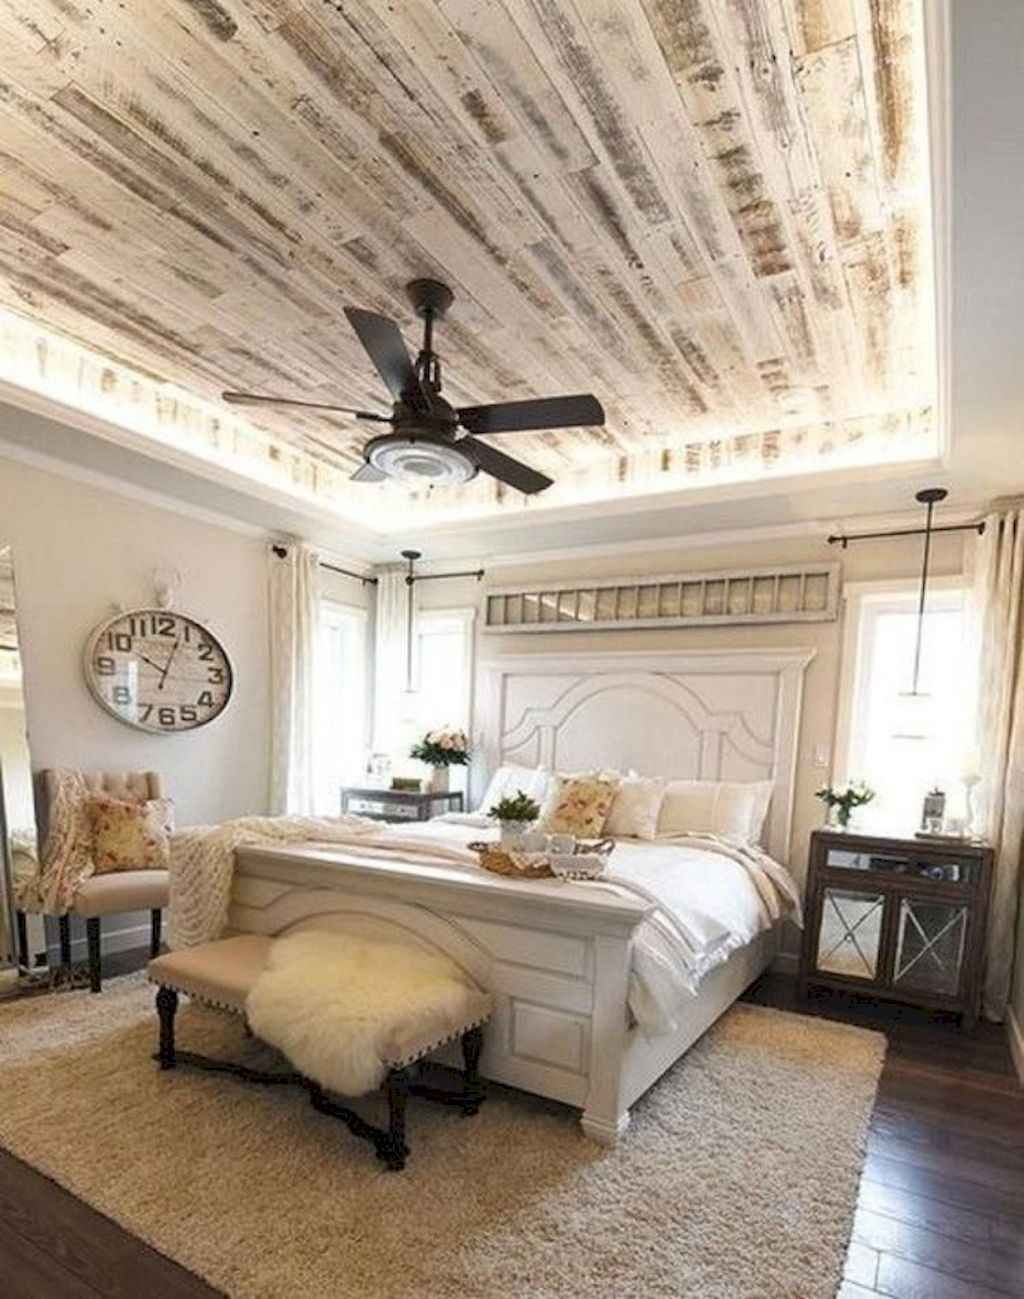 75 Farmhouse Master Bedroom Decorating Ideas Farmhouse Master